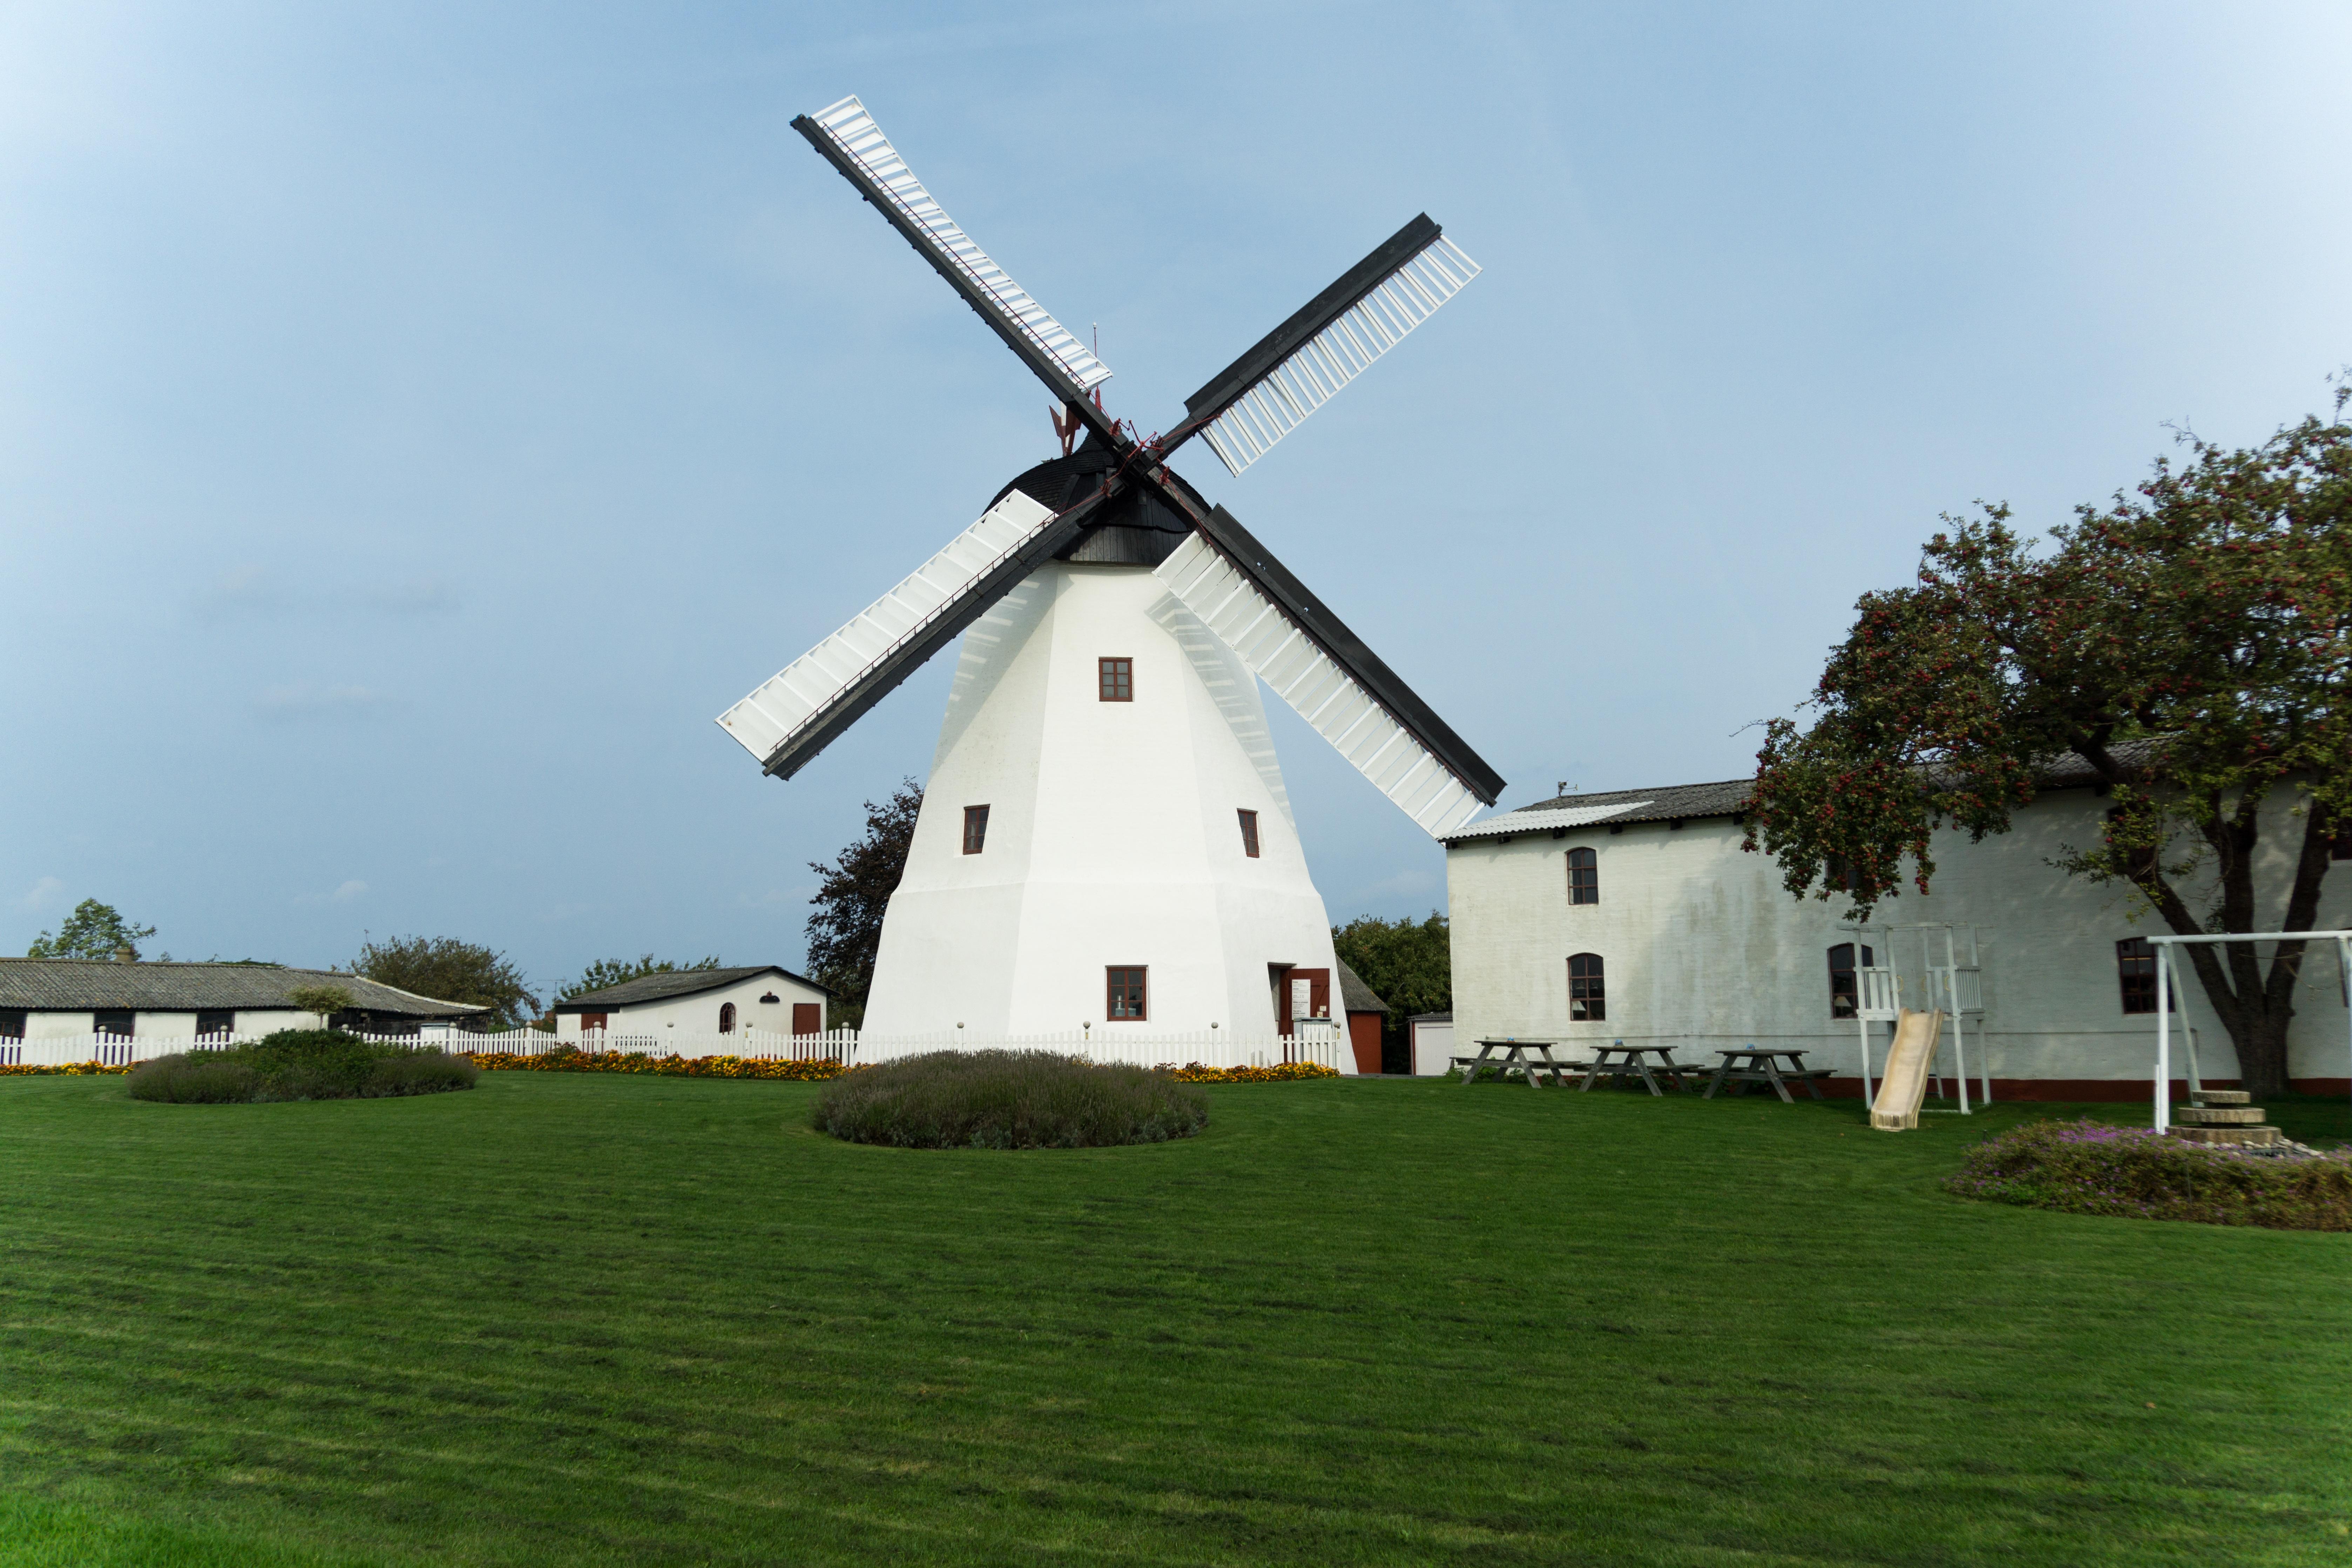 Gudhjem, Bornholm, Denmark скачать